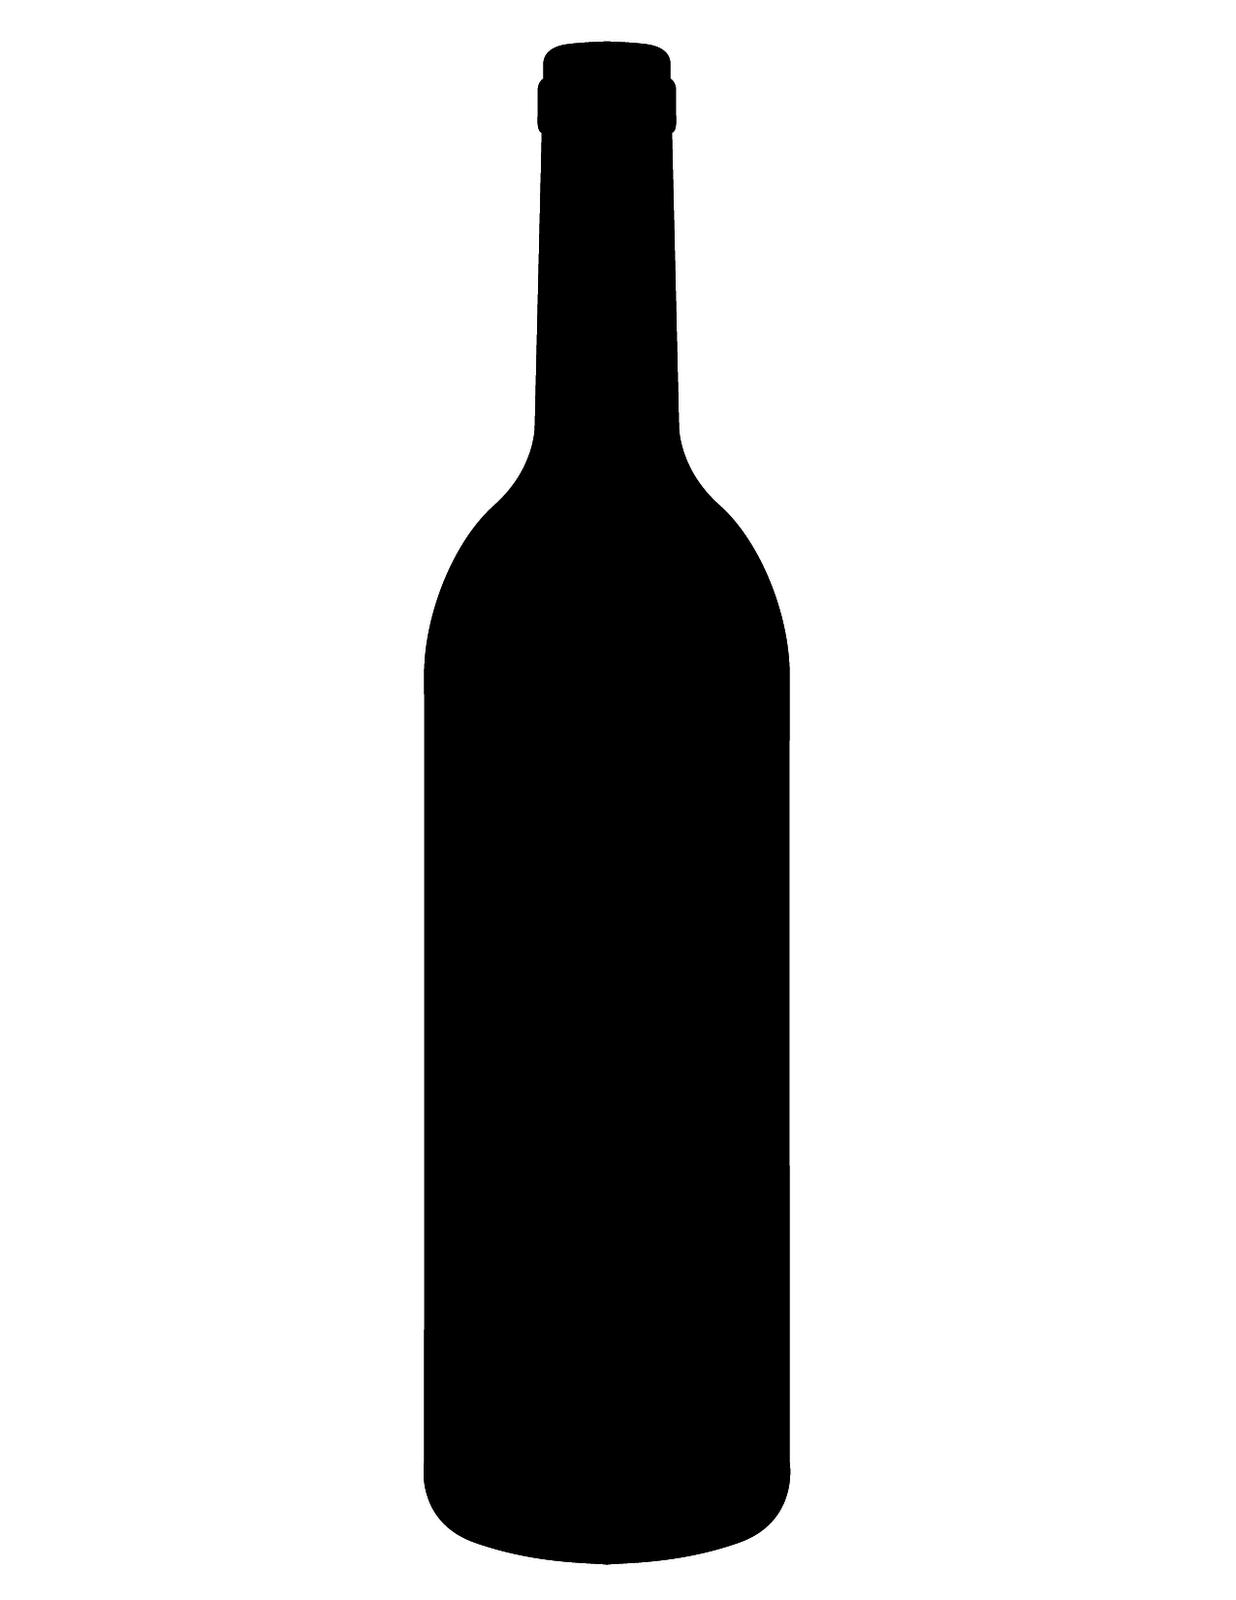 $40 Bottle (Knights of Columbus)